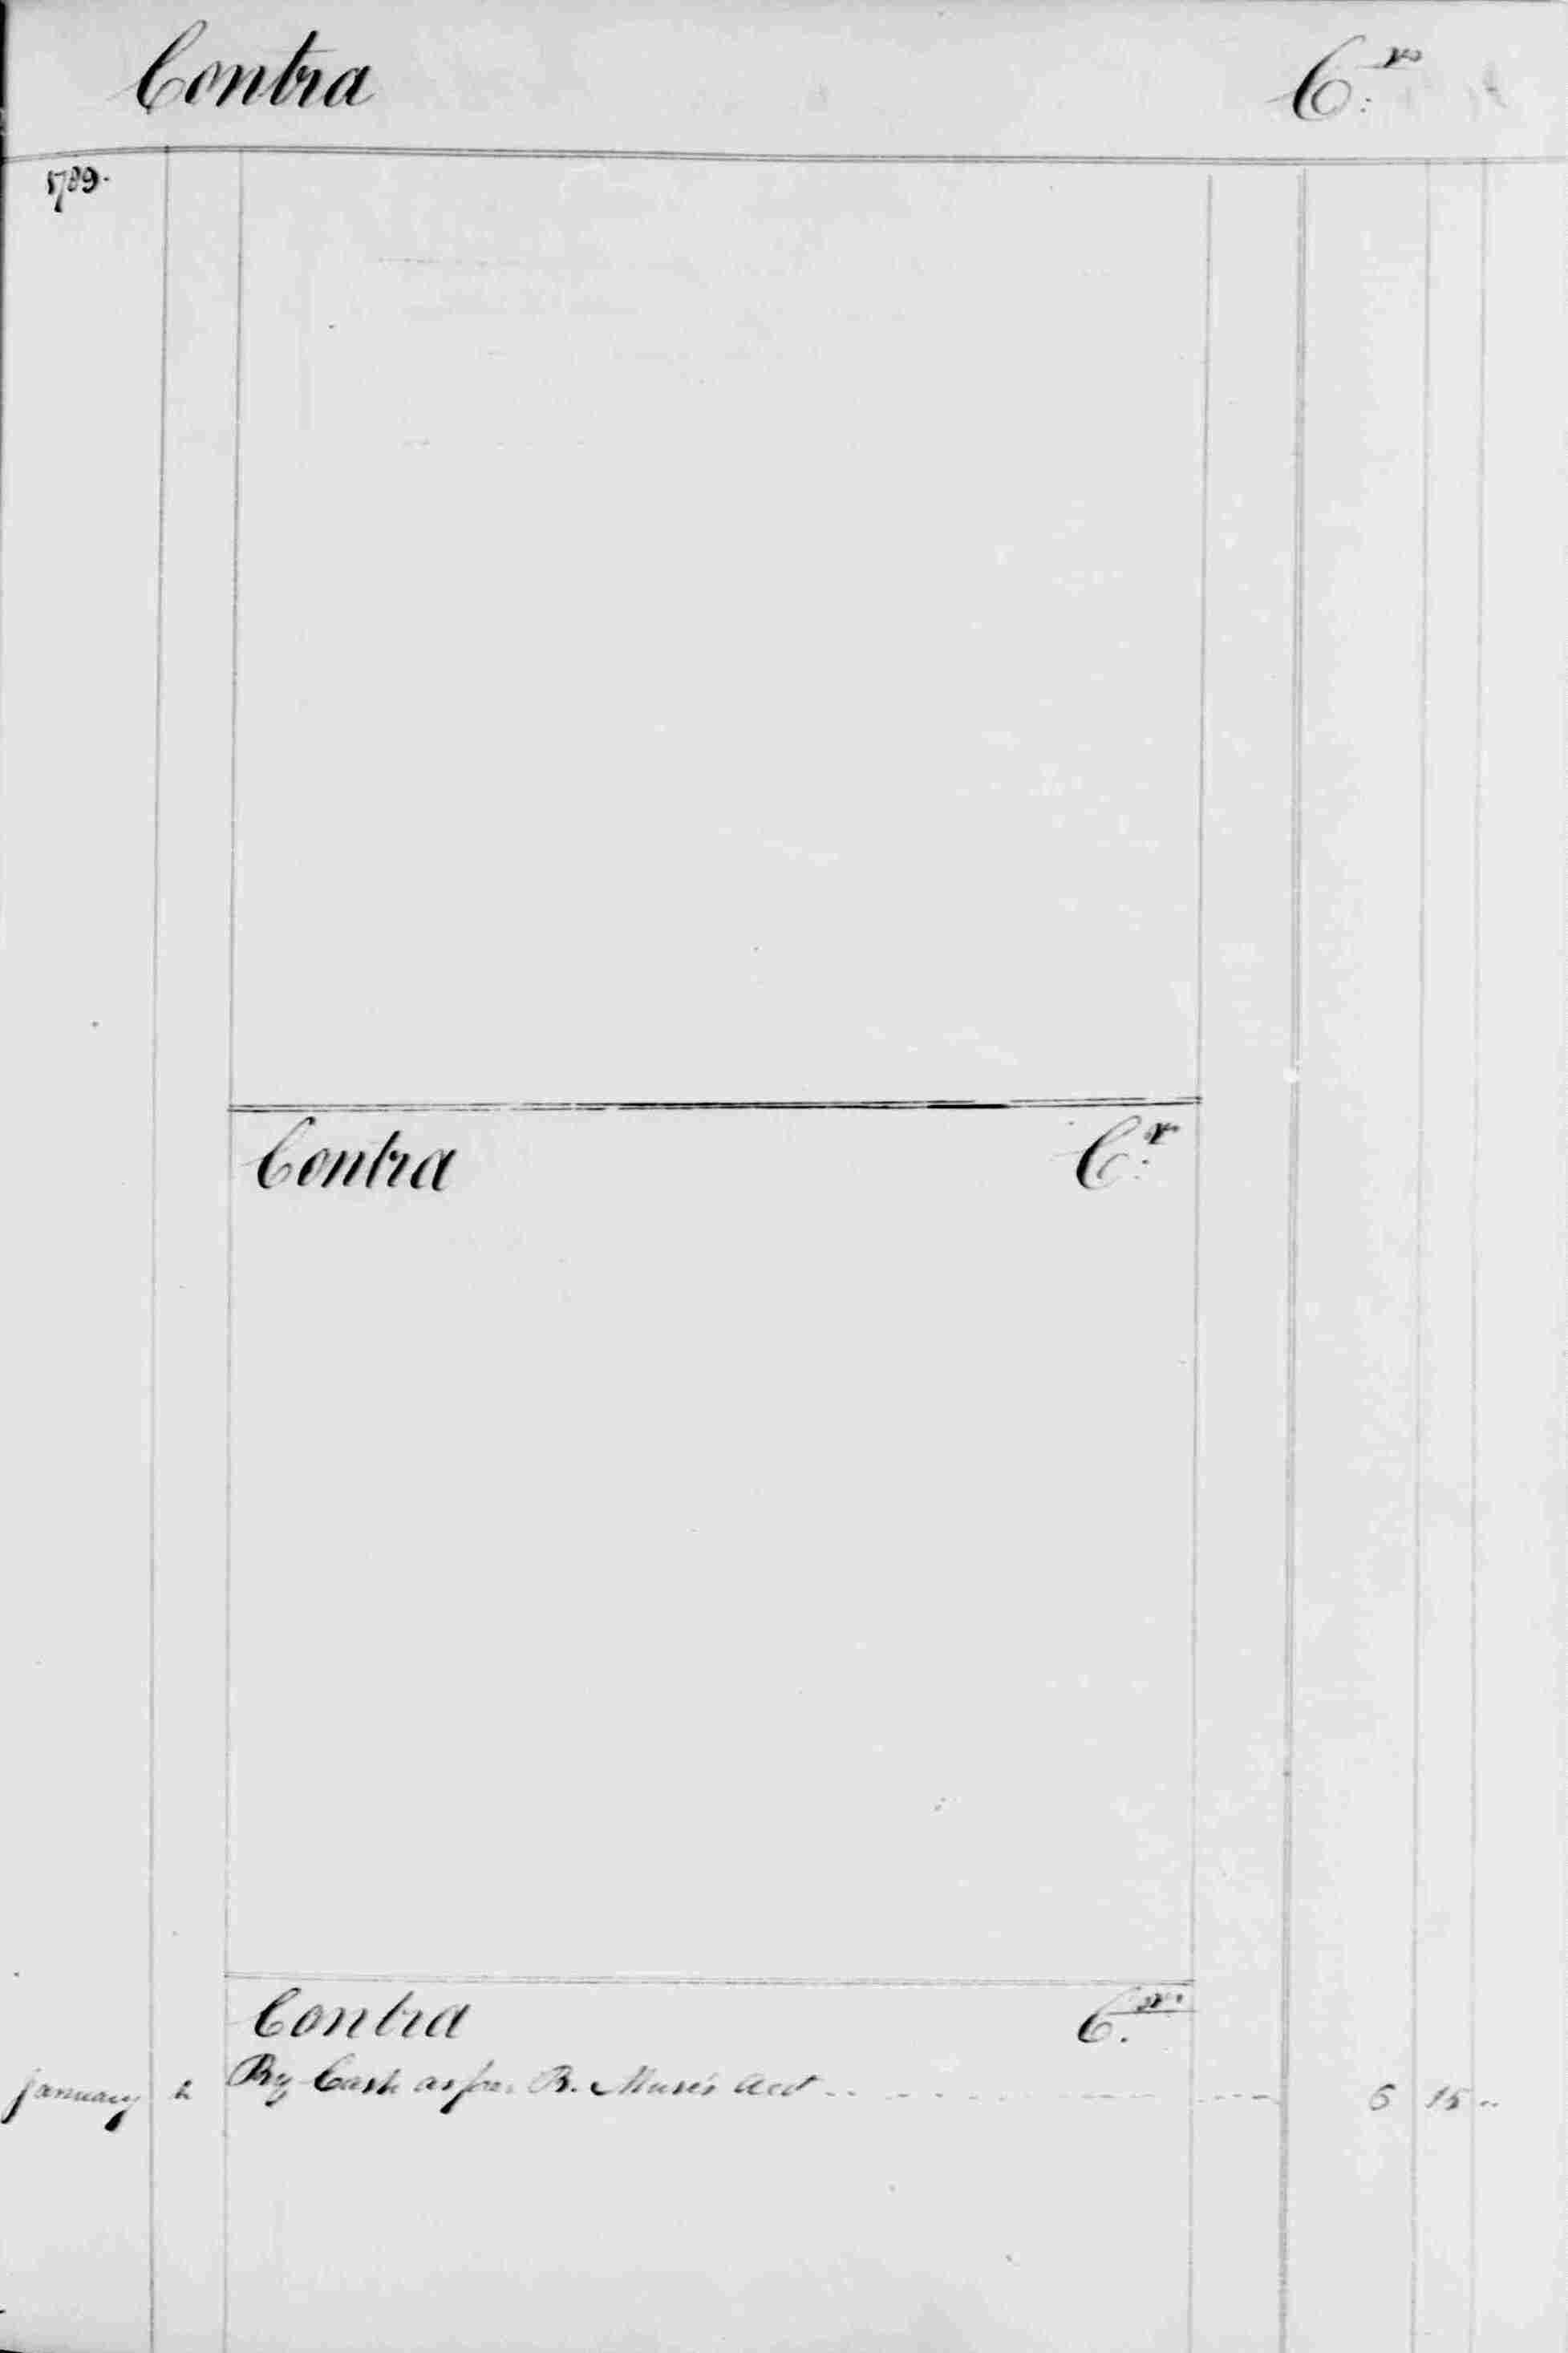 Ledger B, folio 284, right side